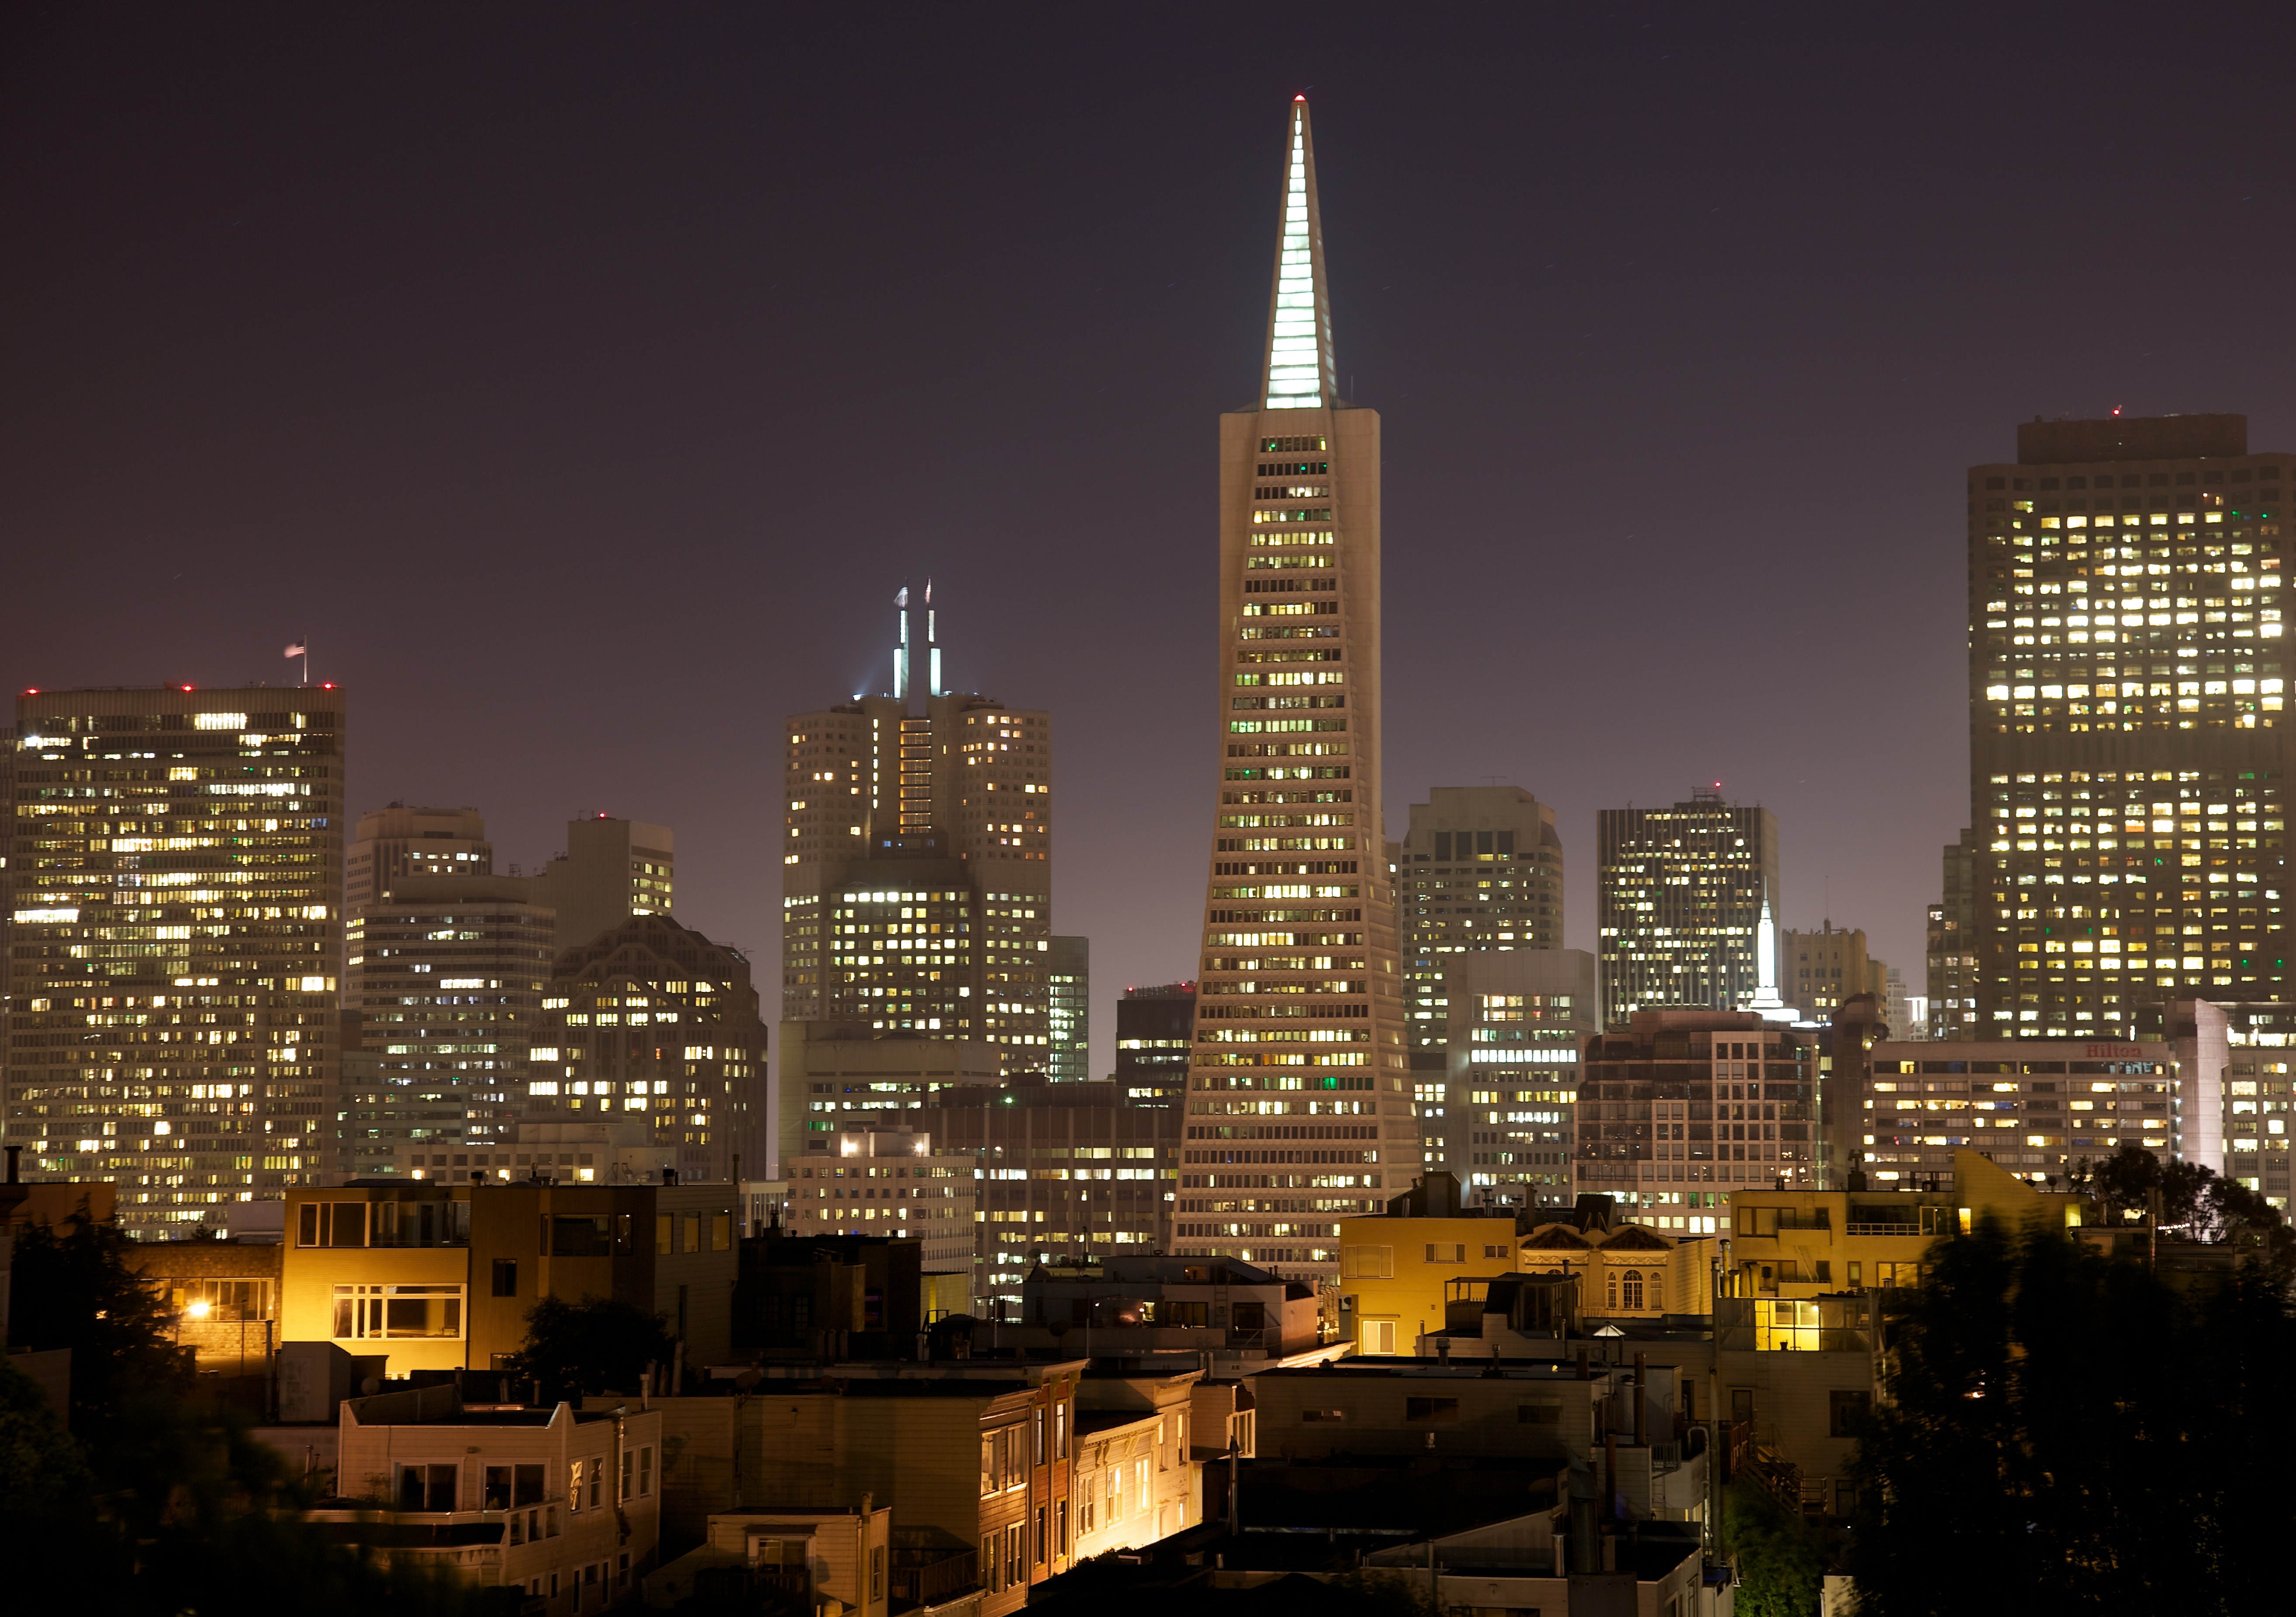 File:San Francisco Cityscape.jpg - Wikimedia Commons